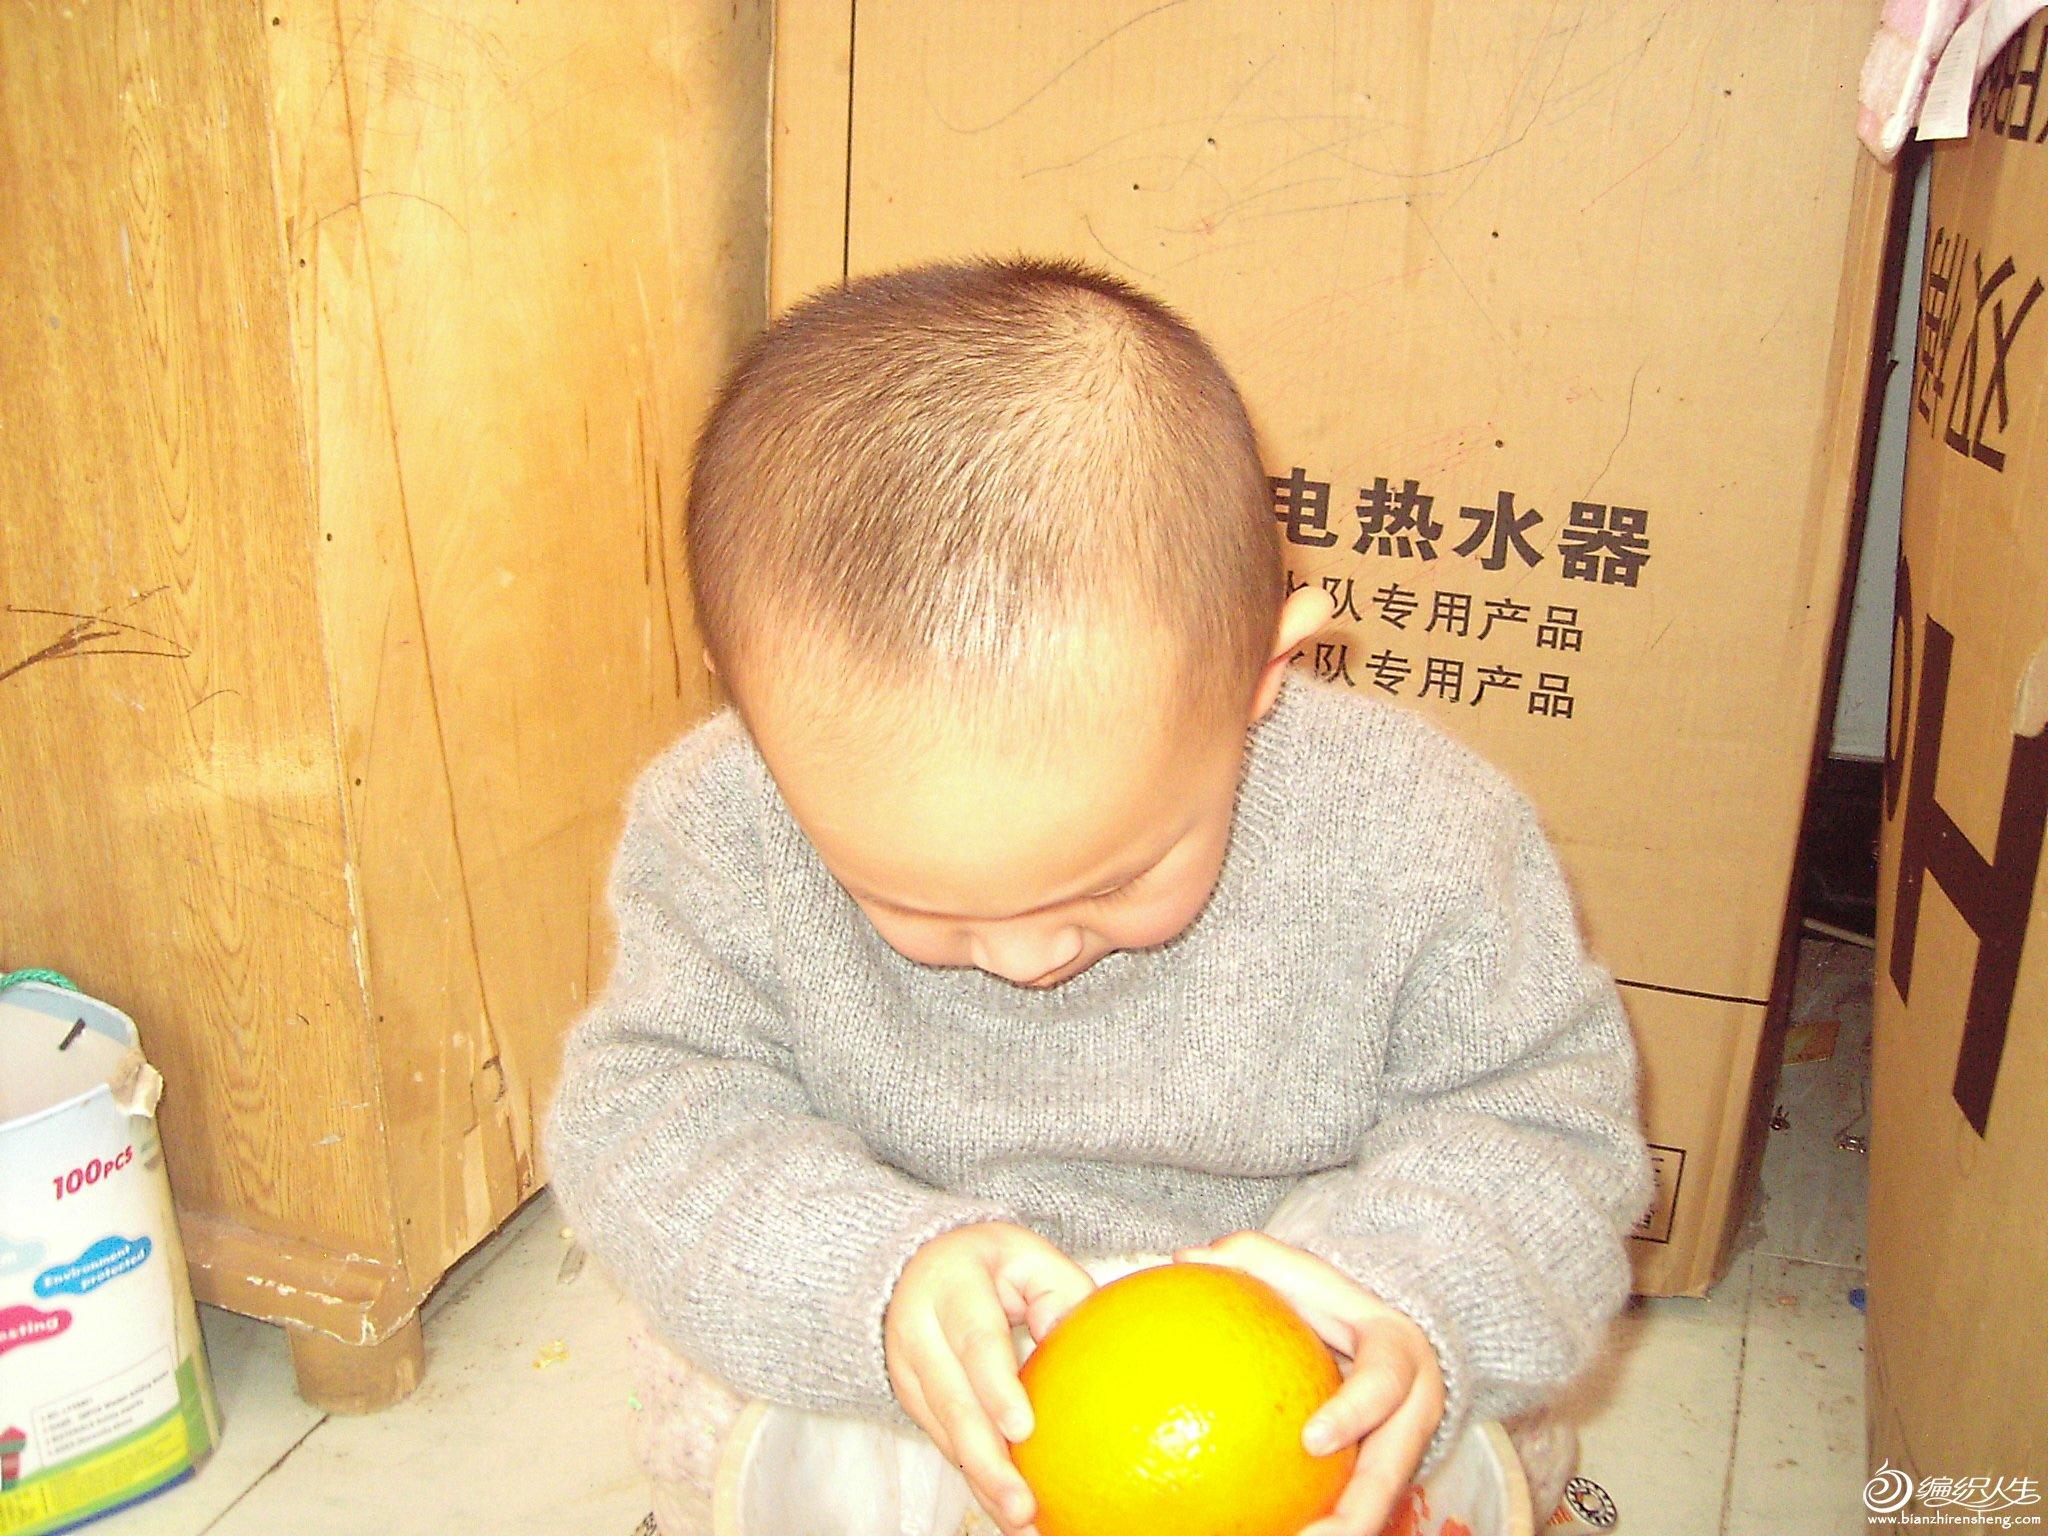 PIC_0162.JPG